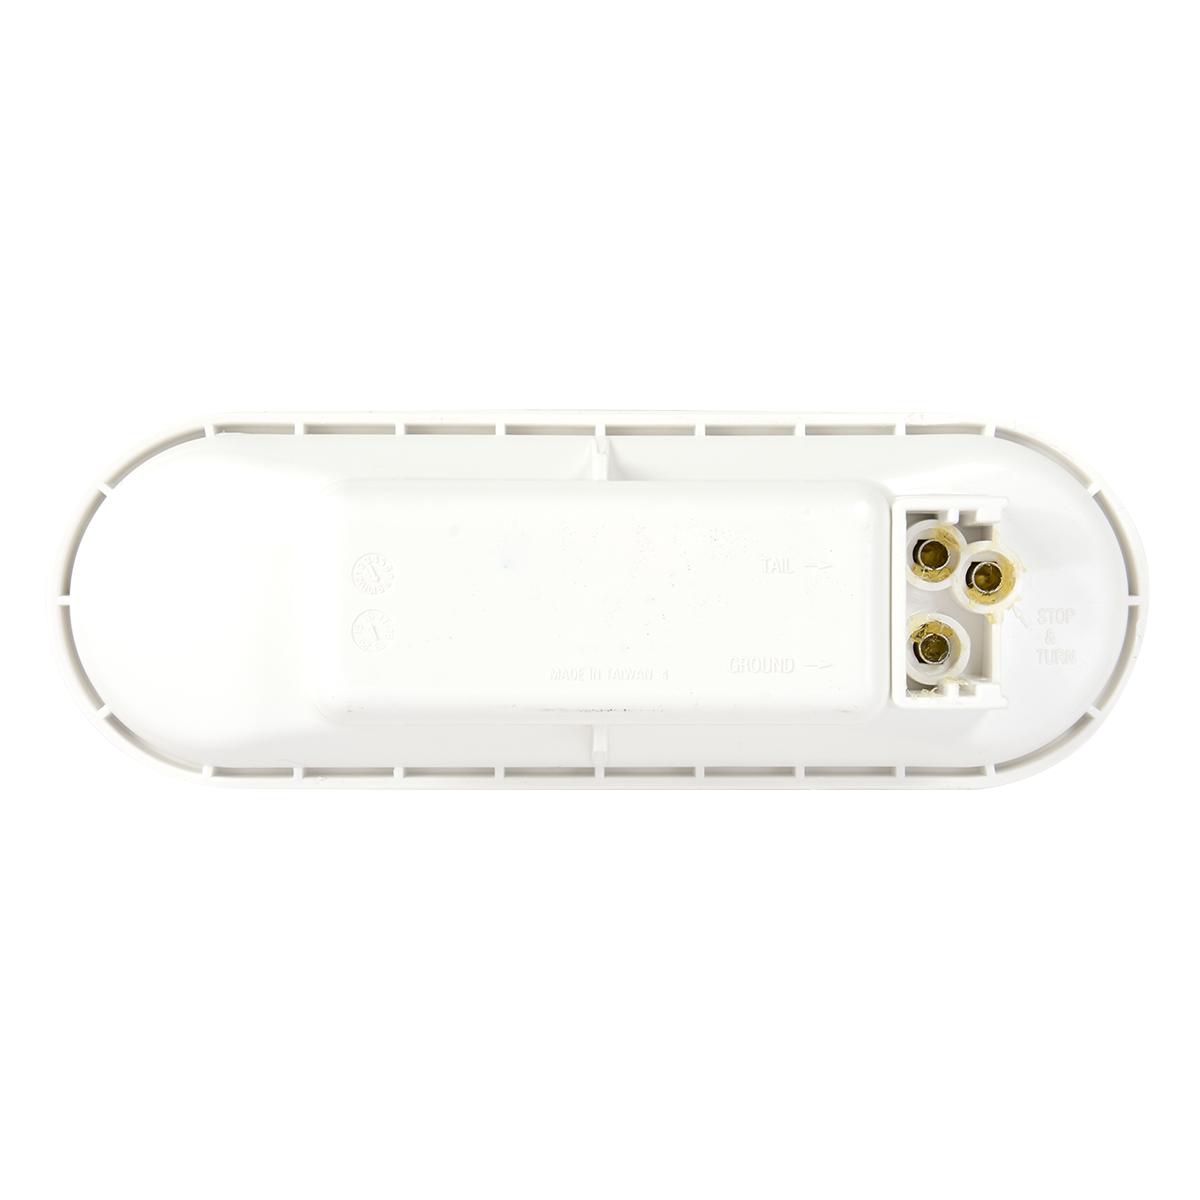 Oval Single High Power LED Sealed Light